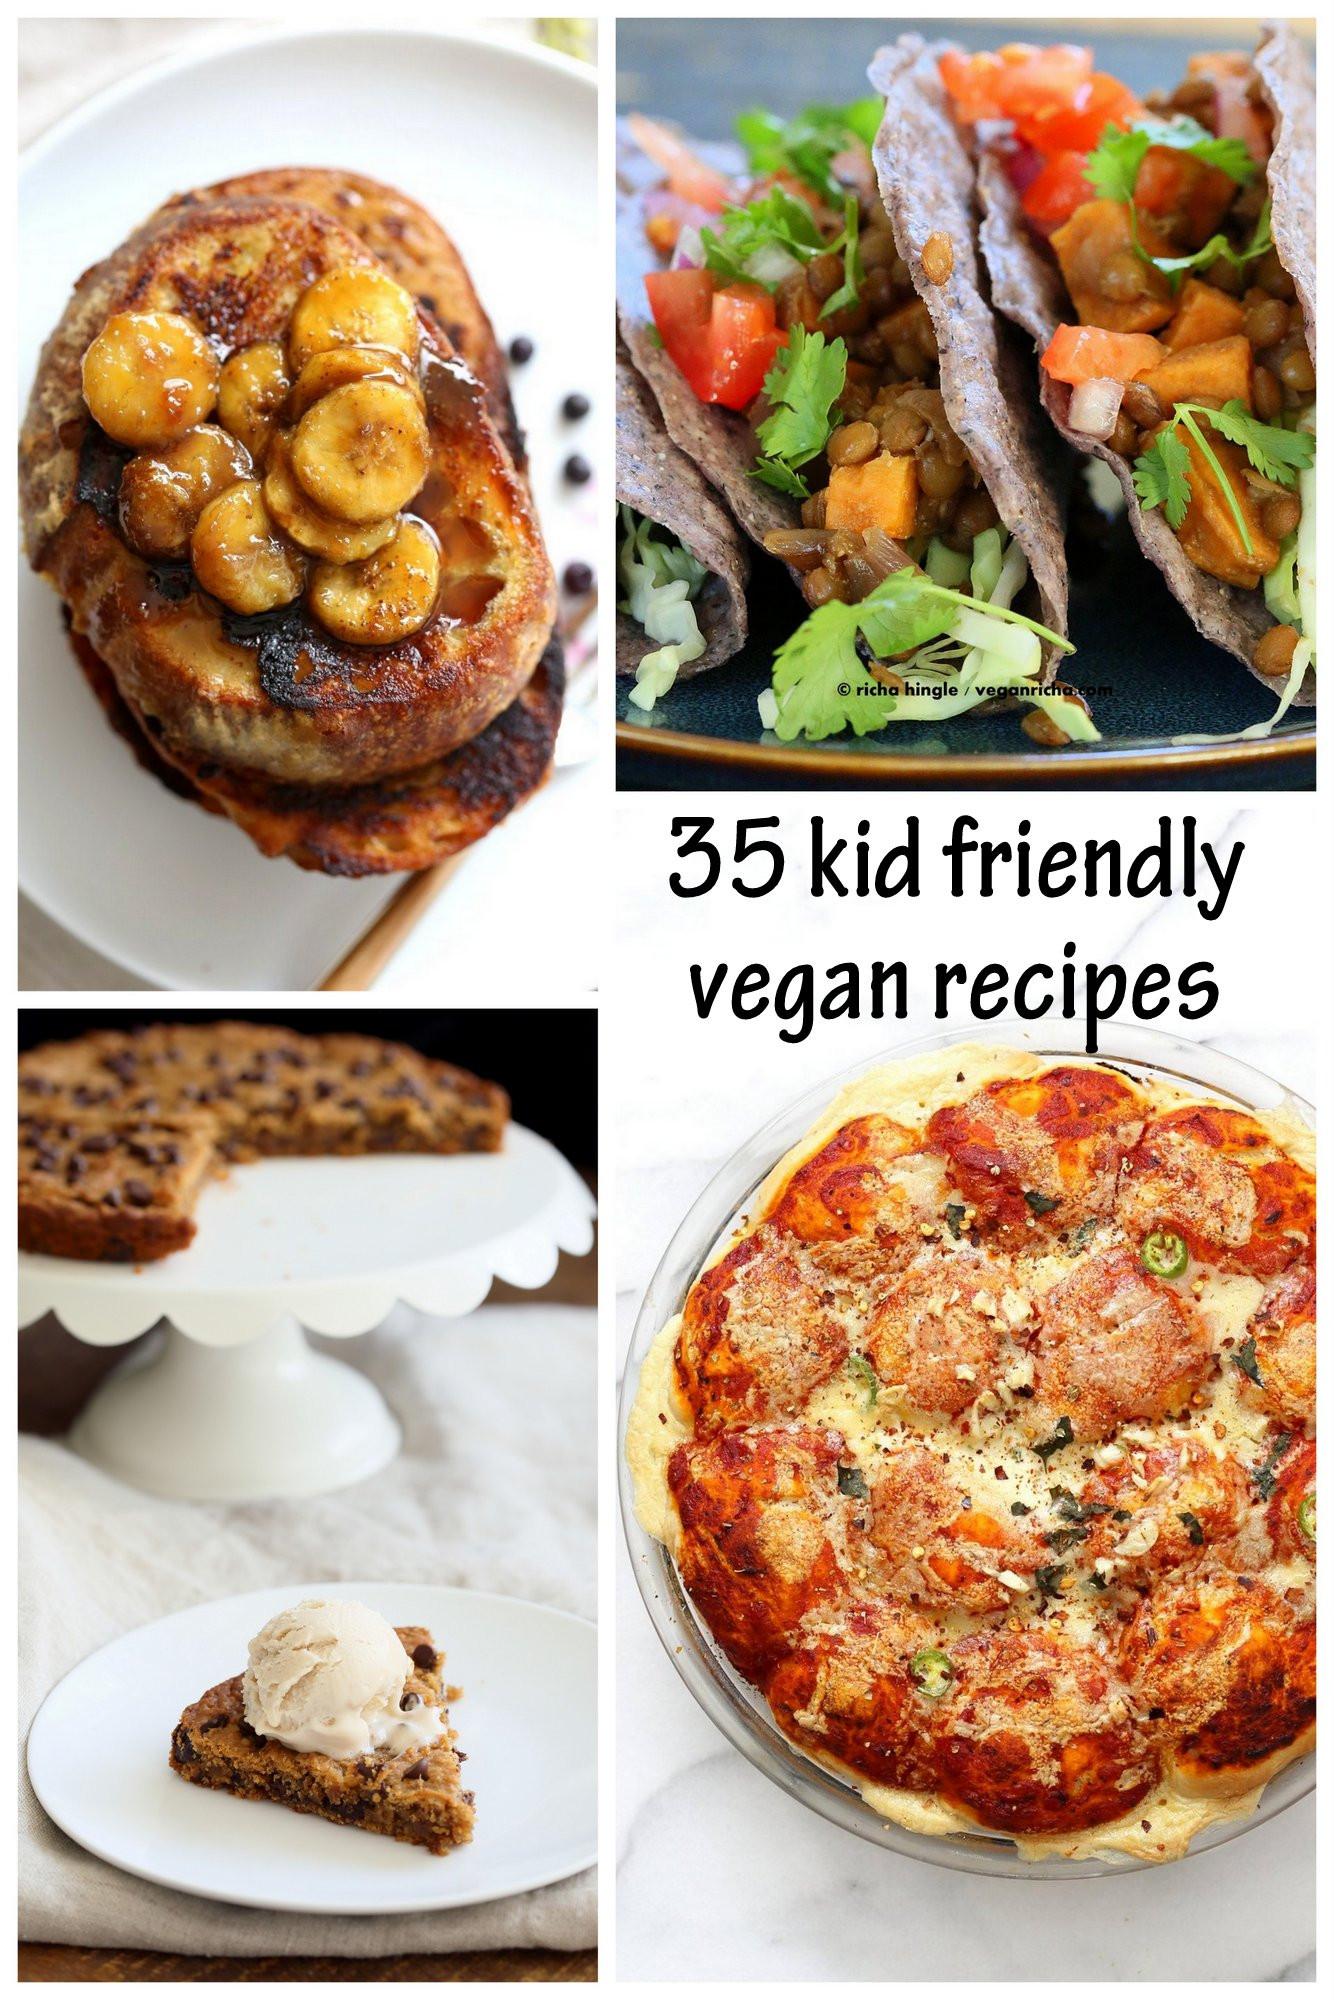 Vegan Snacks Recipes  35 Kid Friendly Vegan Recipes Vegan Richa